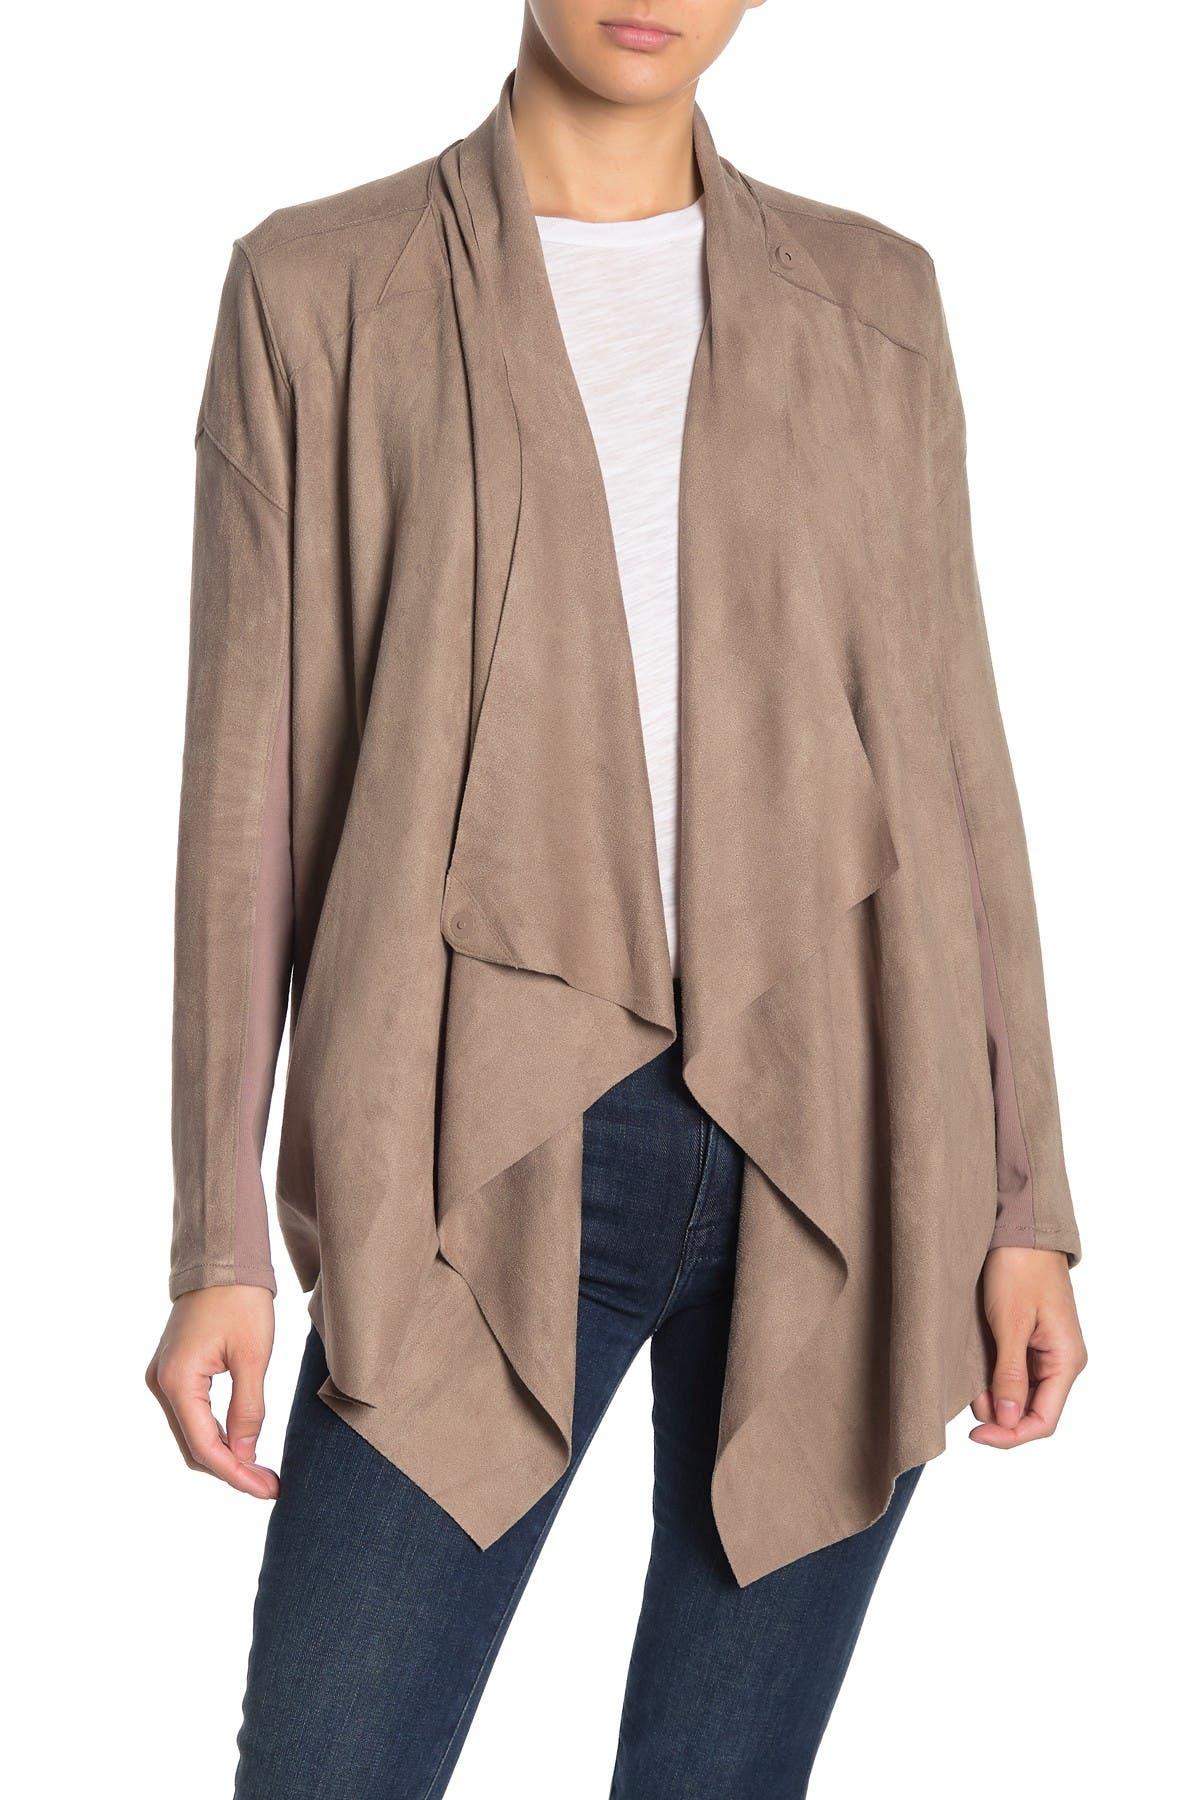 Image of BLANKNYC Denim Faux Suede Draped Jacket